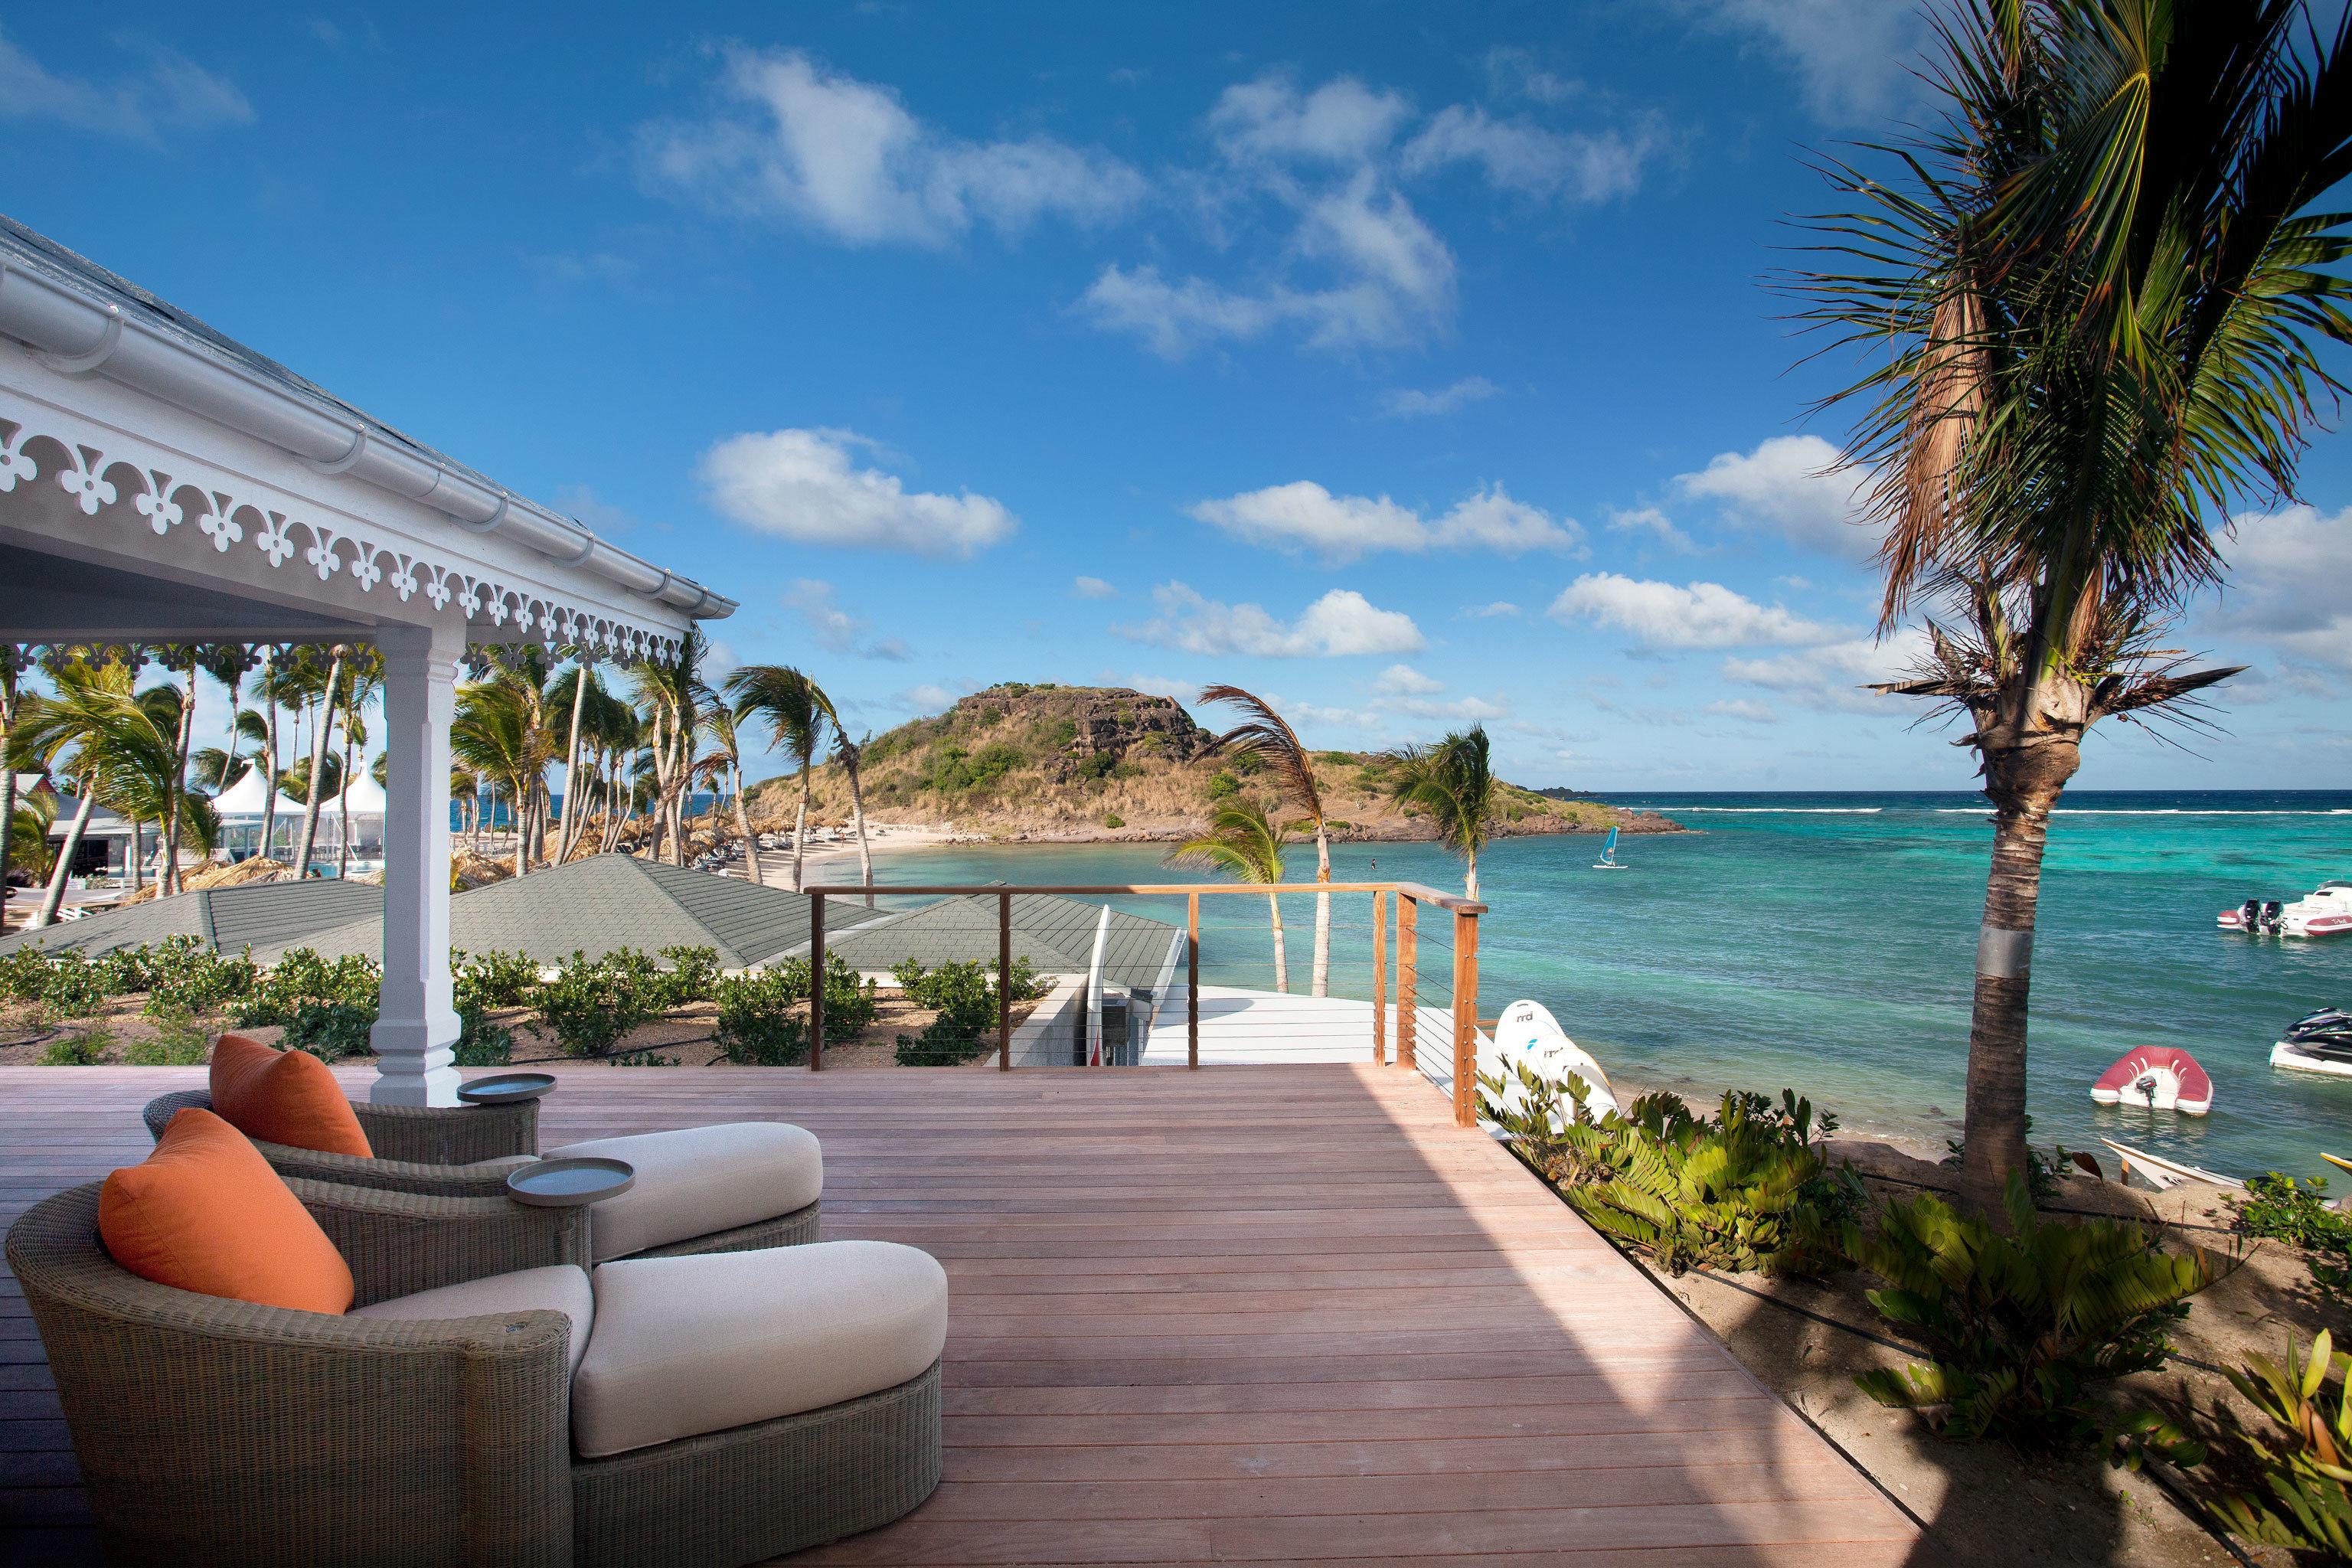 Beach Beachfront Hotels Lounge Ocean Trip Ideas sky water leisure property Resort swimming pool caribbean Villa Sea palm walkway condominium overlooking shore